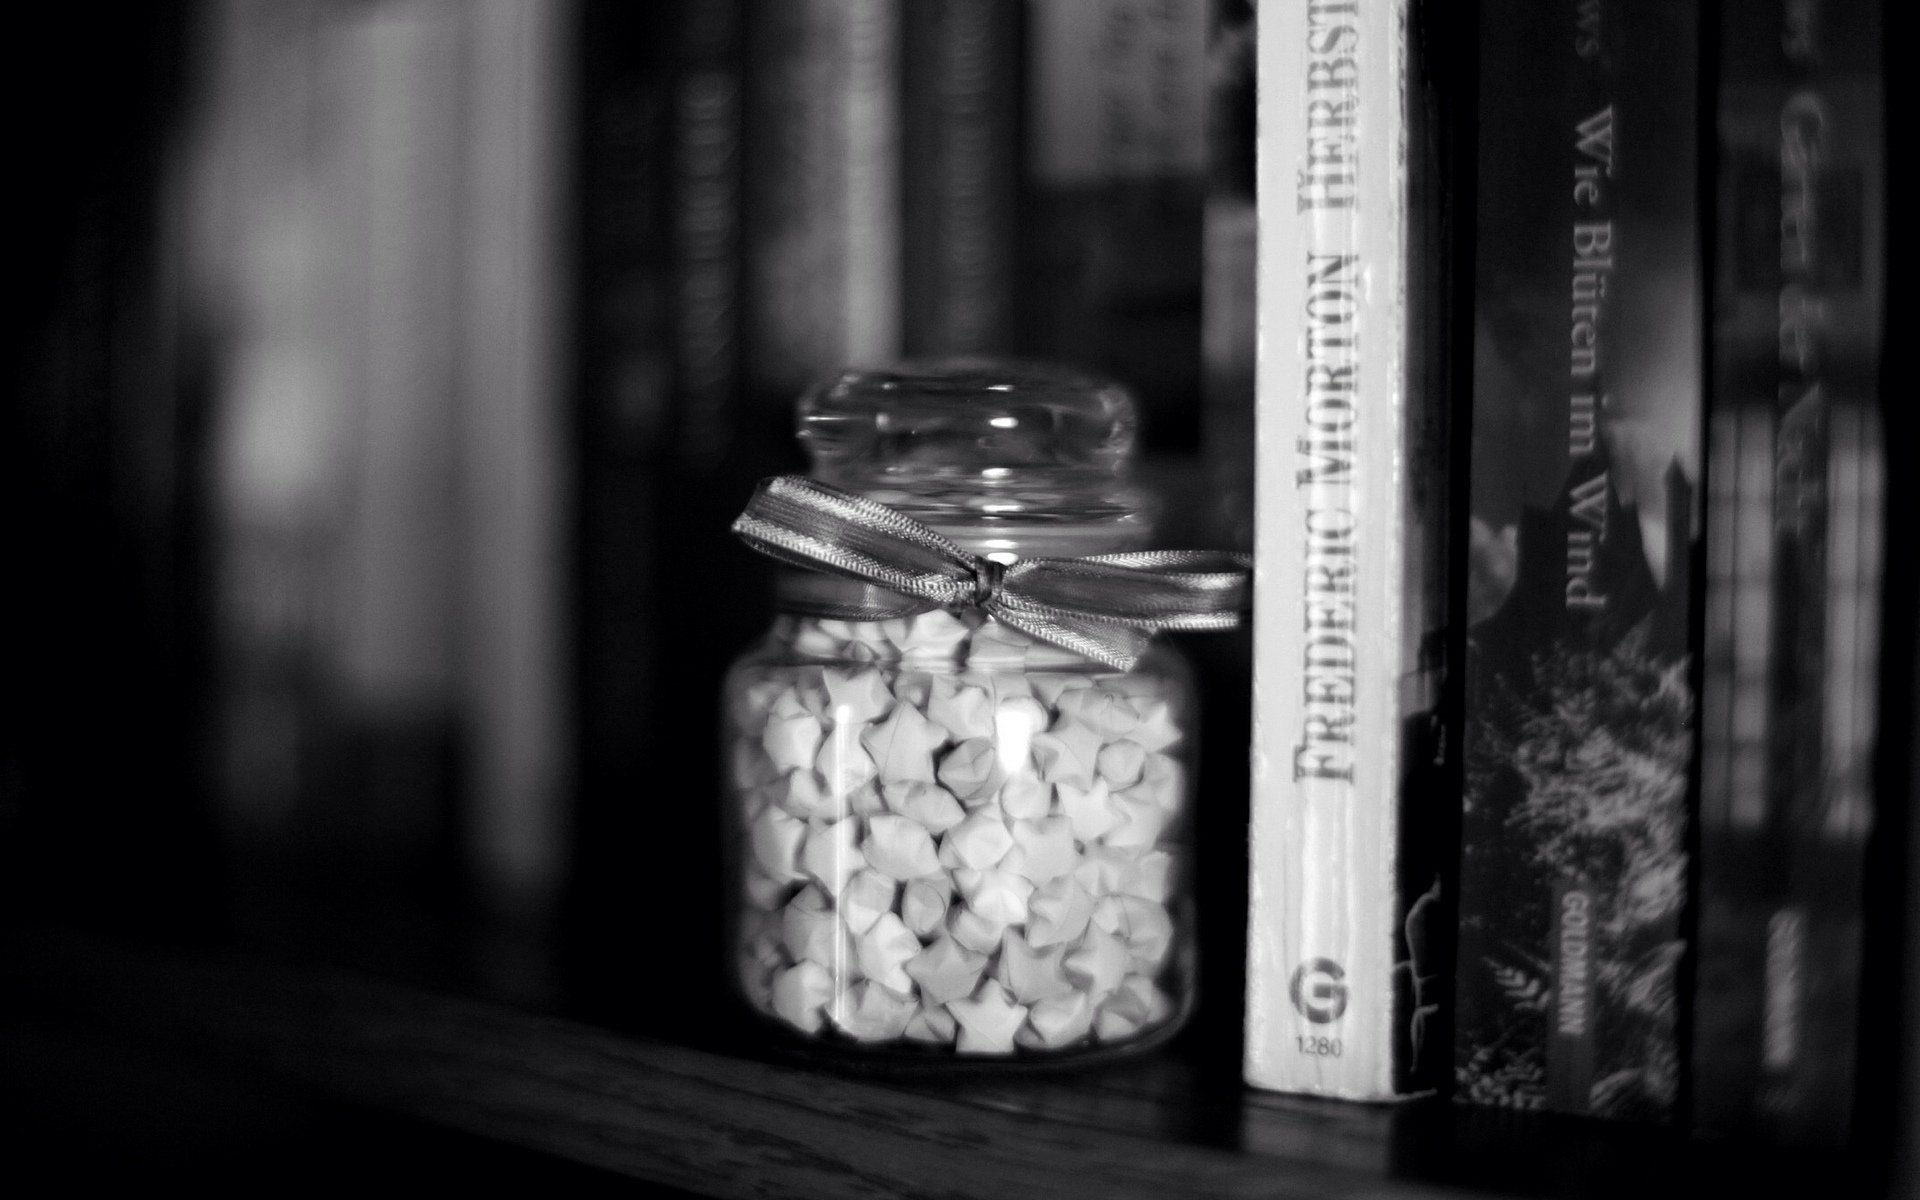 книги чёрно-белые картинки